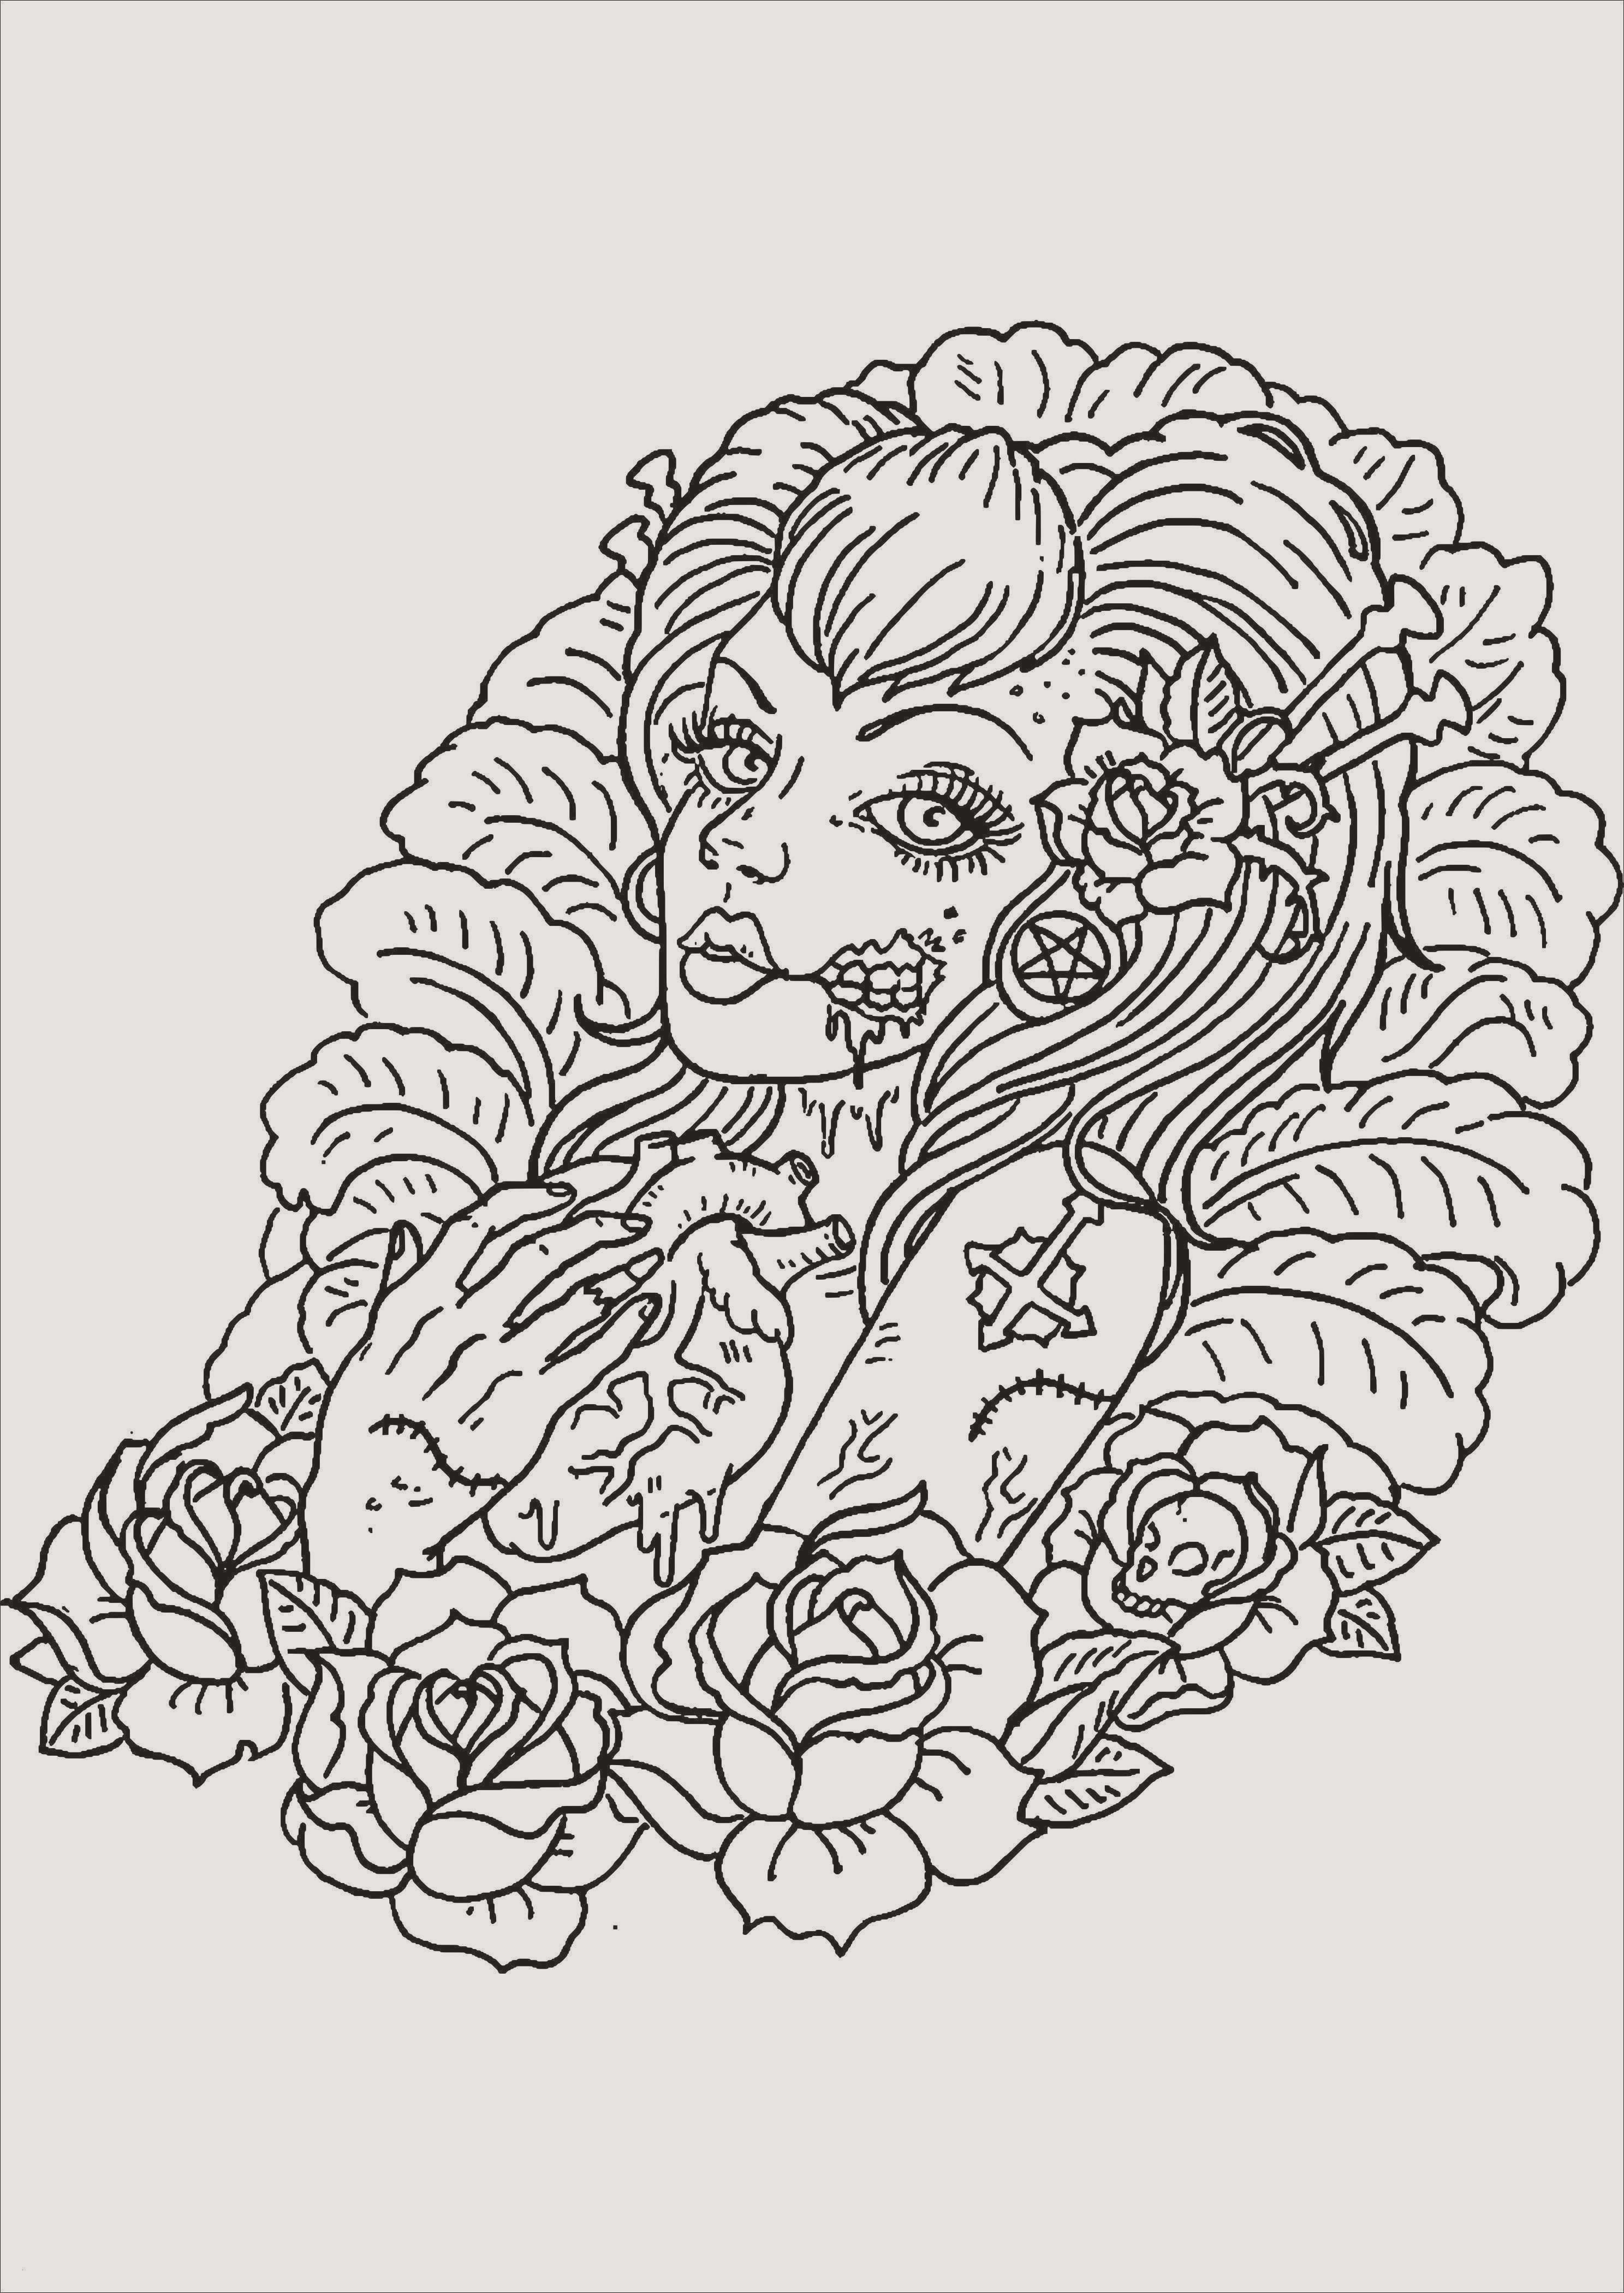 Ausmalbilder Drachen Genial Mandala Drachen Frisch 31 Kostenlose Ausmalbilder Mandala Fƒ Galerie